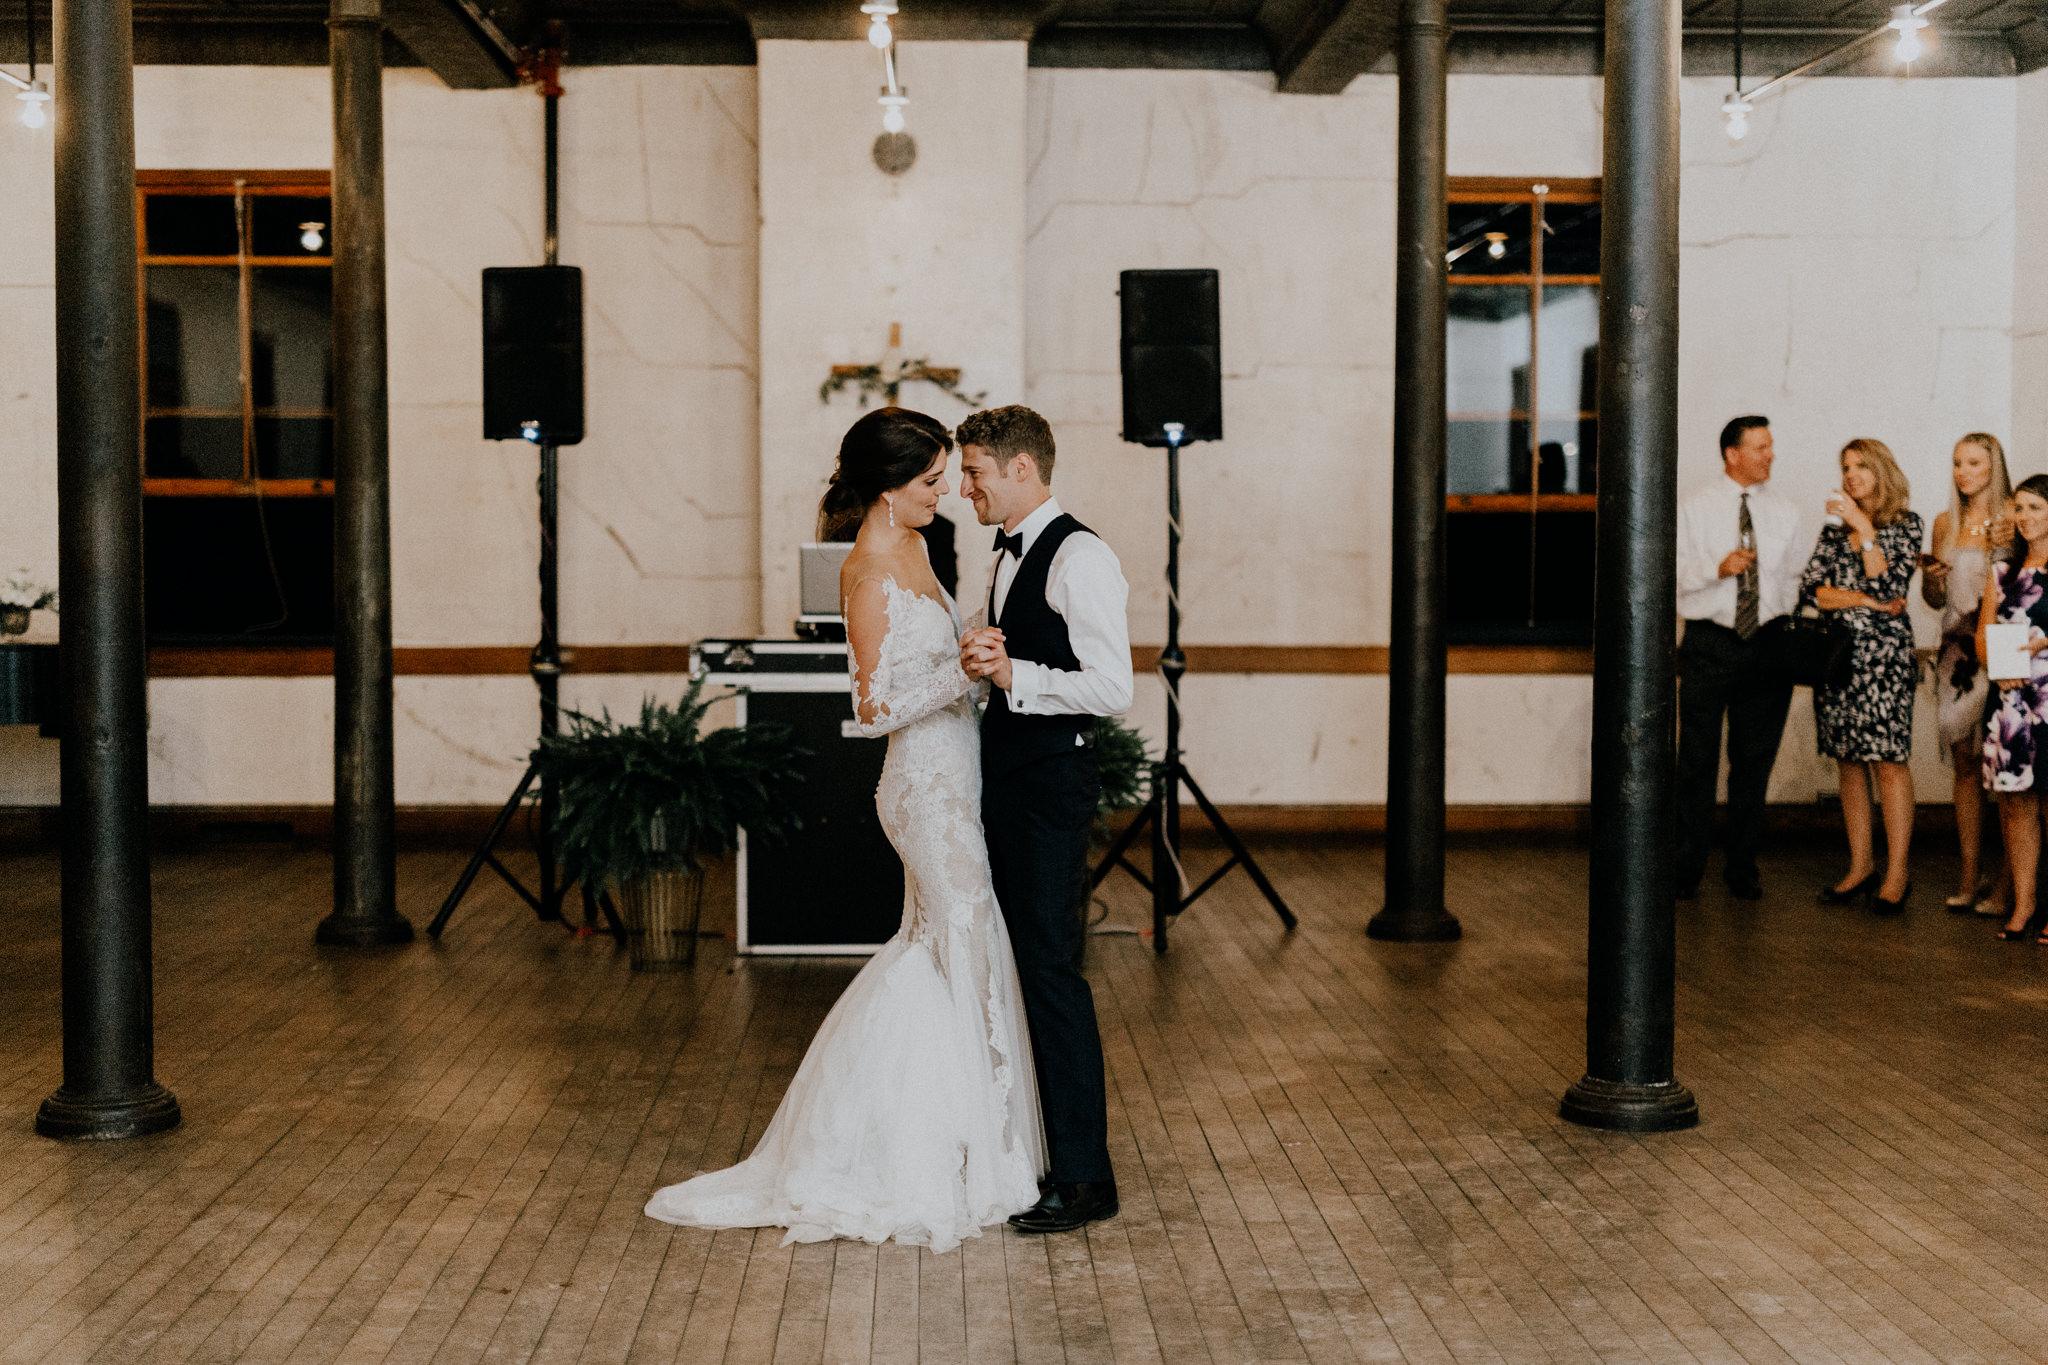 wedding-headlands-center-for-the-arts-sausalito-136.jpg